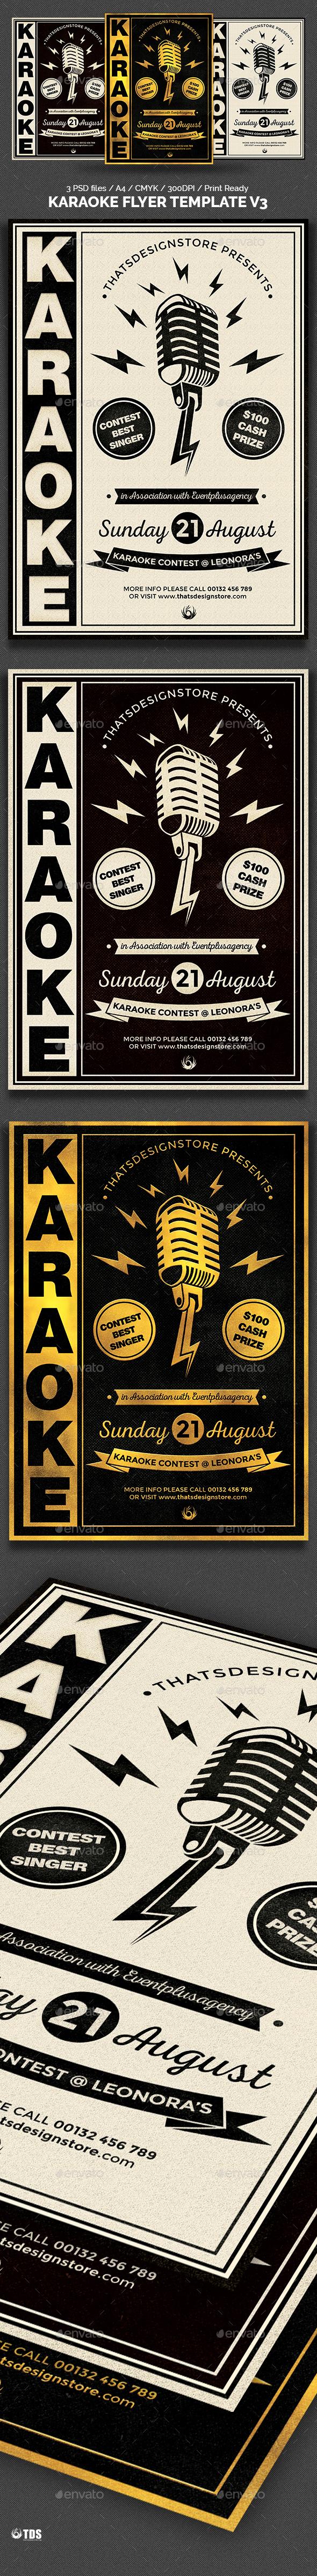 Karaoke Flyer Template V3 Flyer Template Karaoke And Template